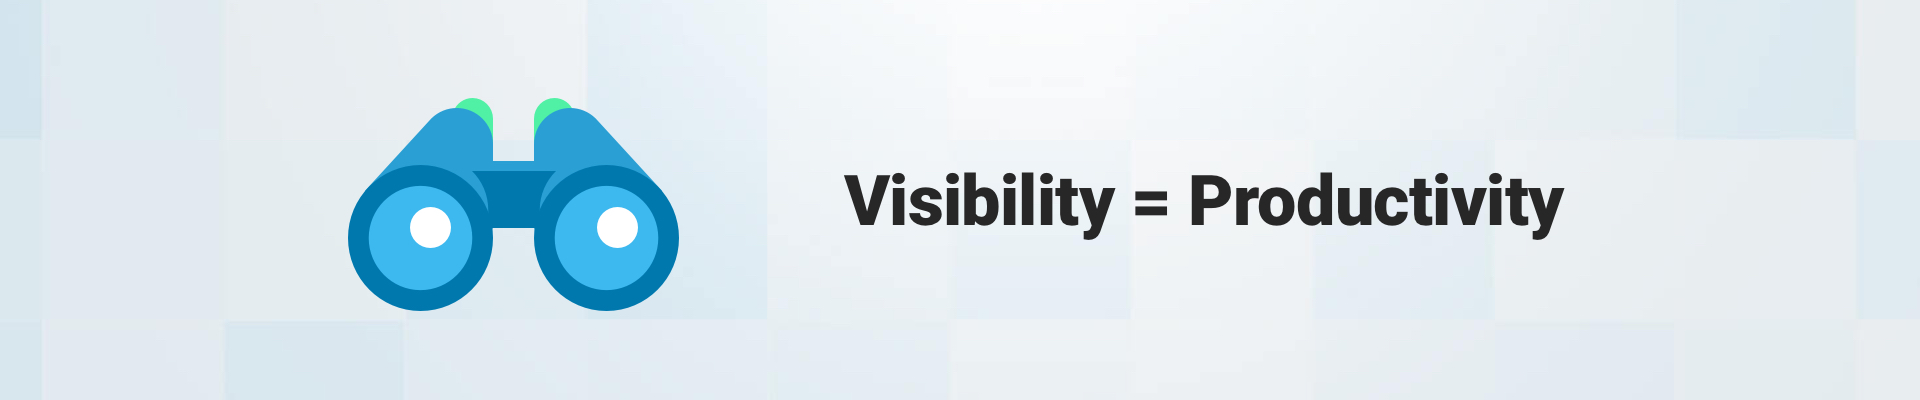 visibility translates to productivity